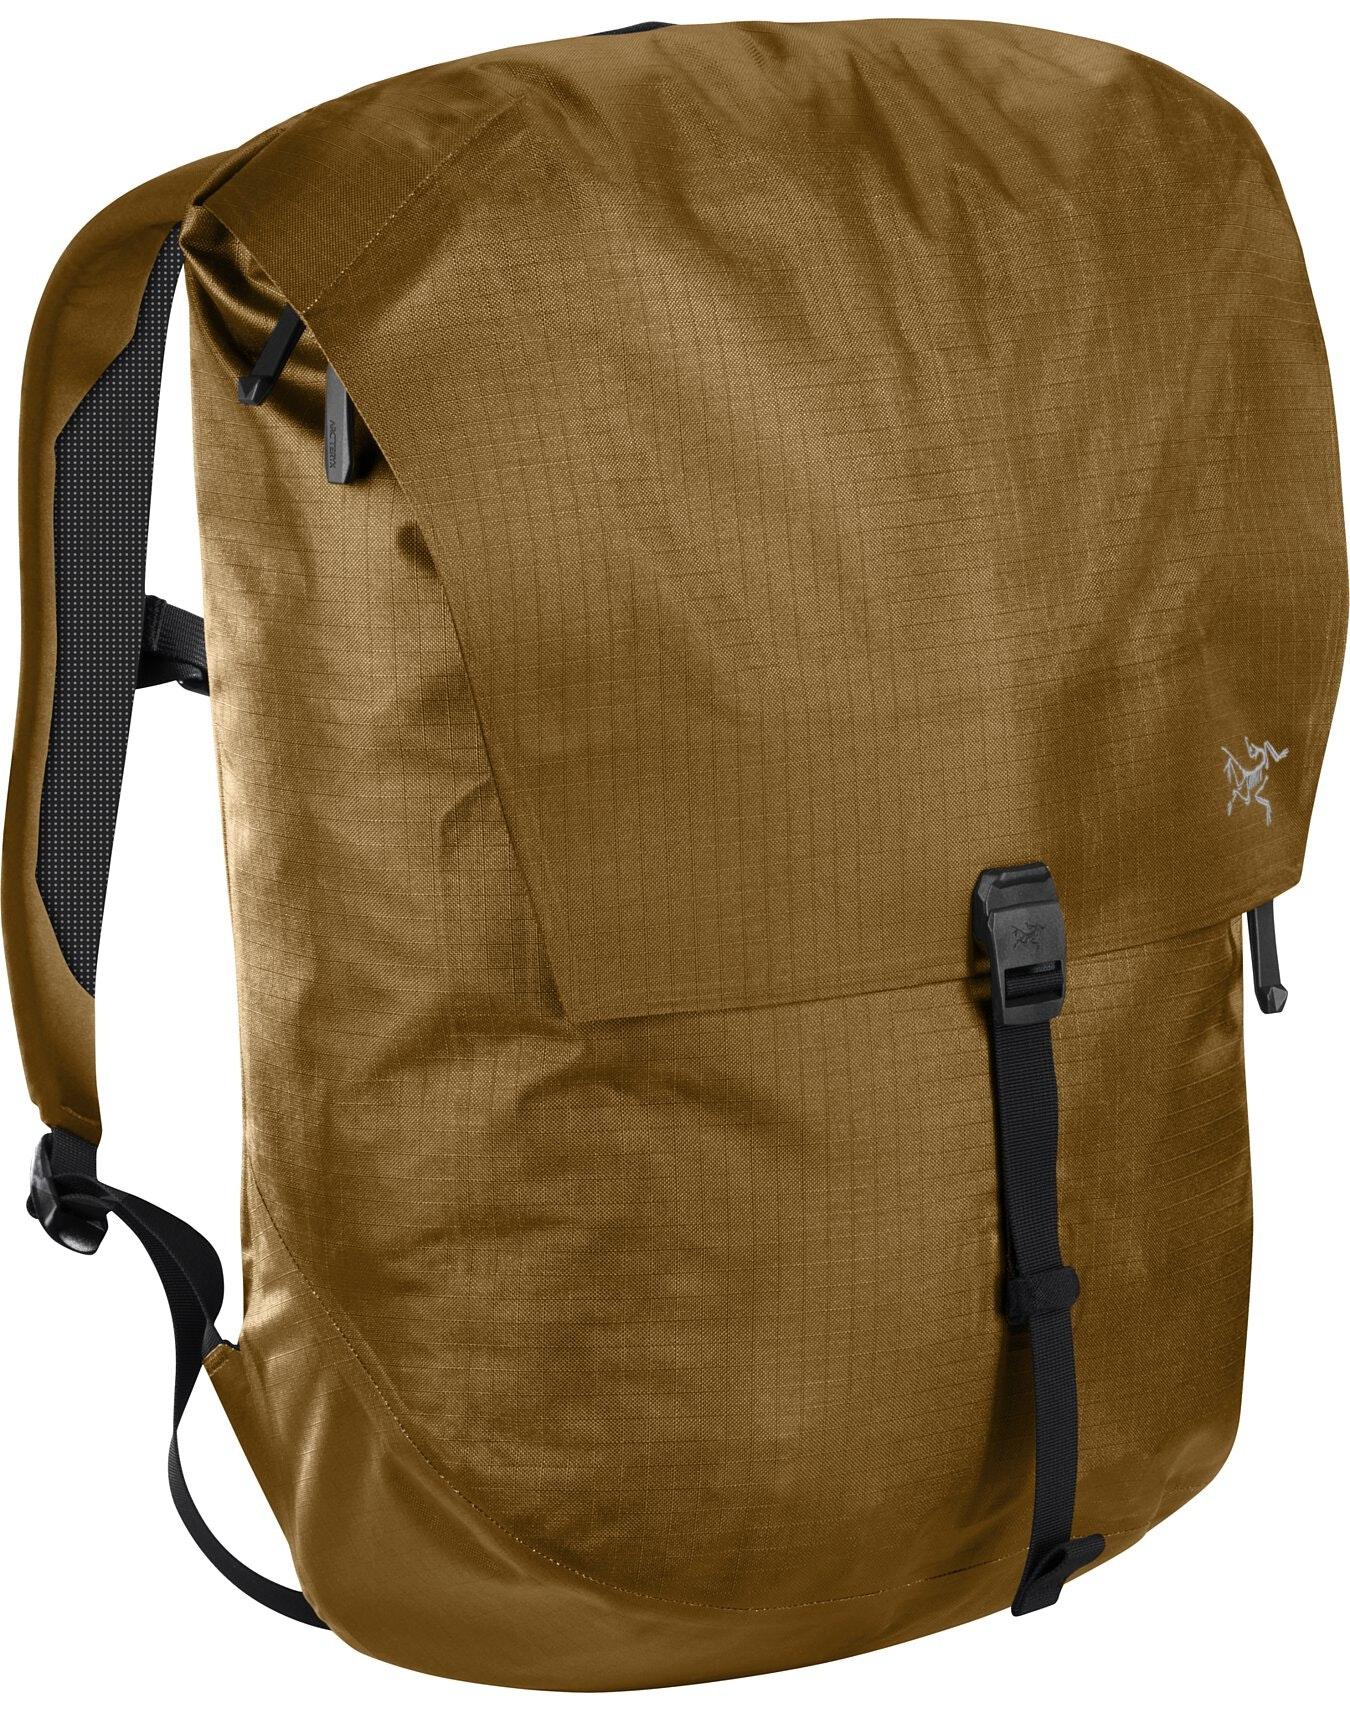 Granville 20 Backpack Yukon